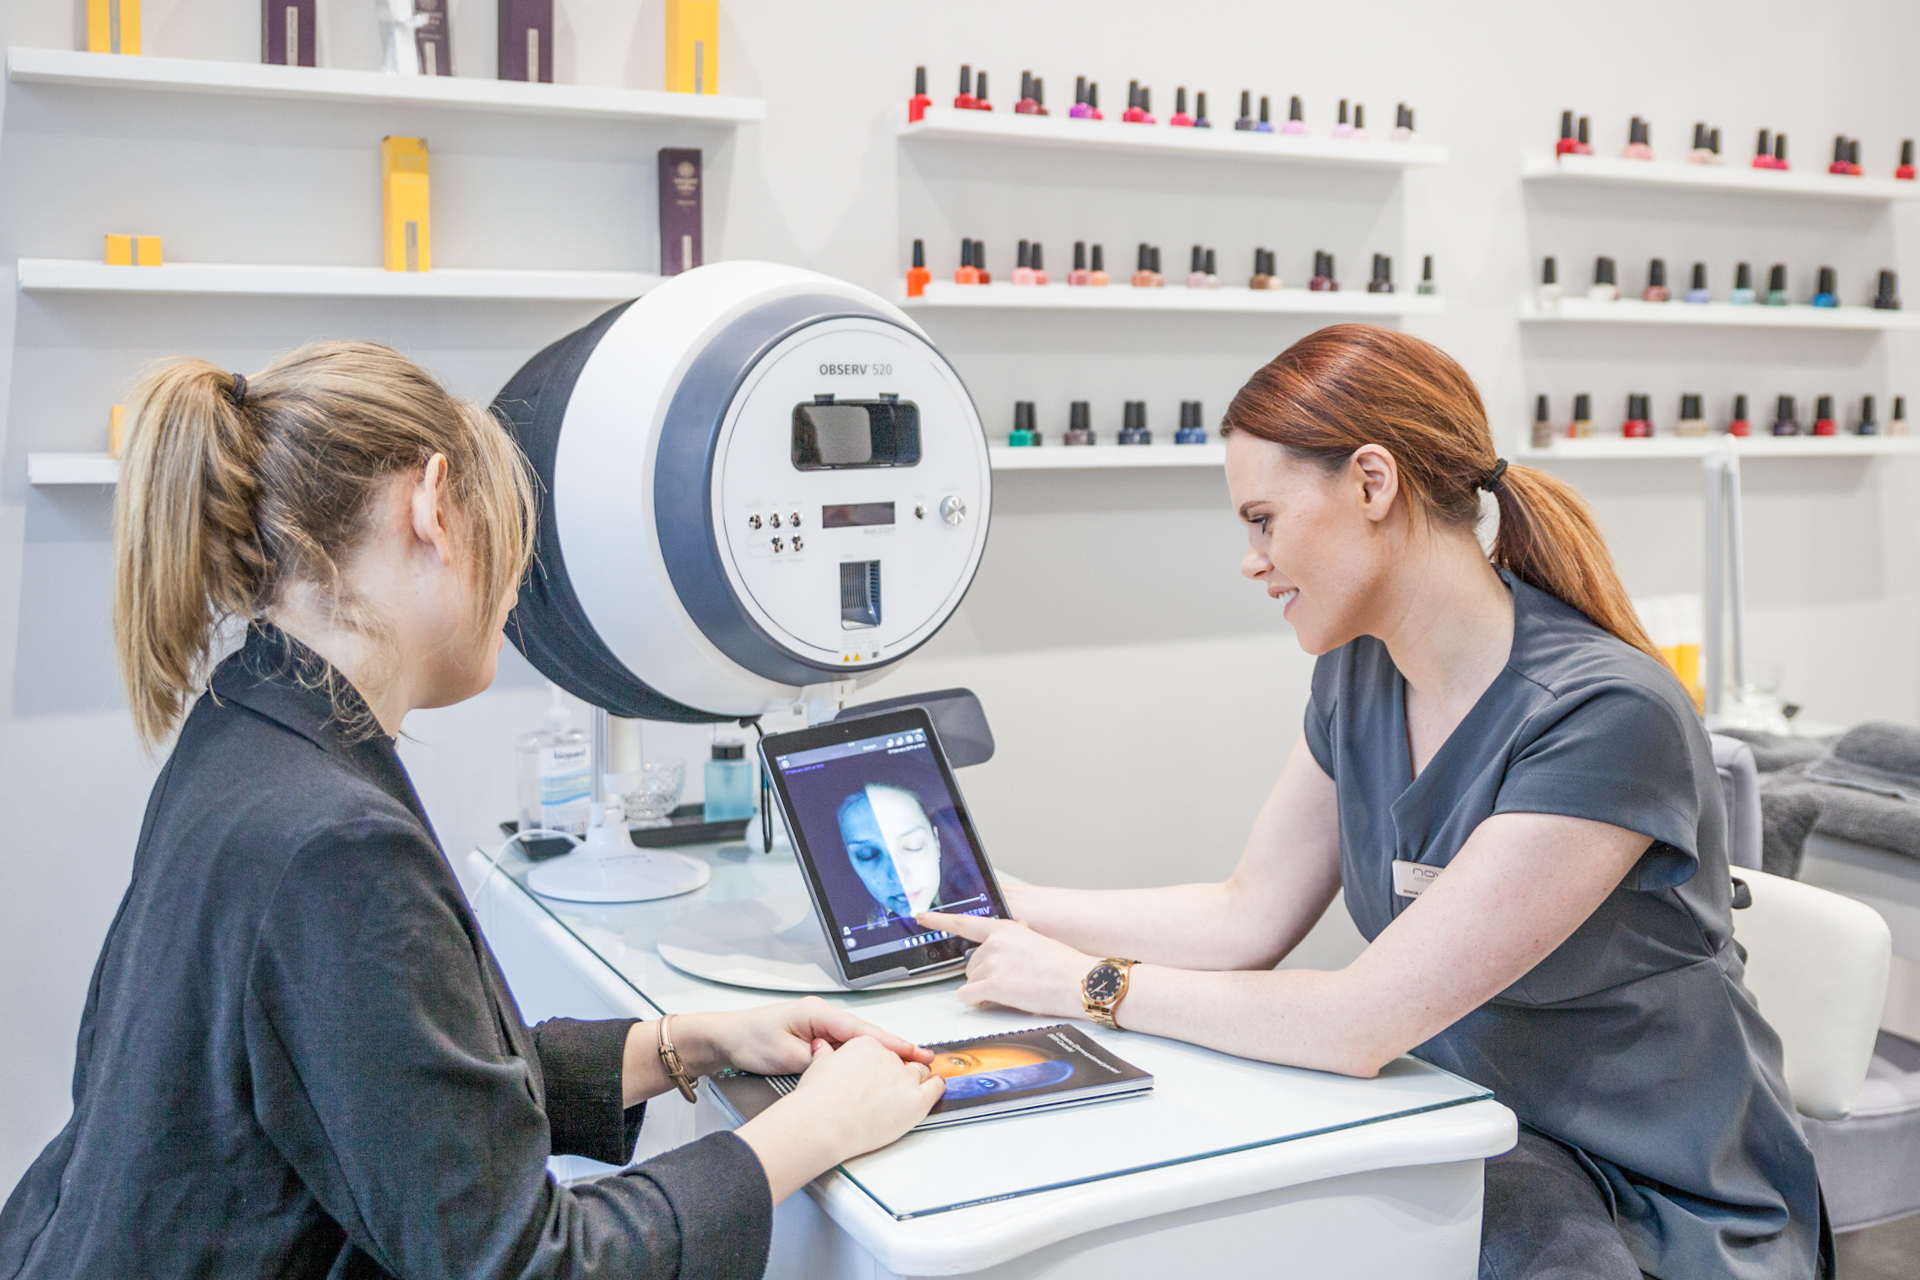 Nova_Aesthetic_Clinic_&_MediSpa_UKD_7_x.jpg